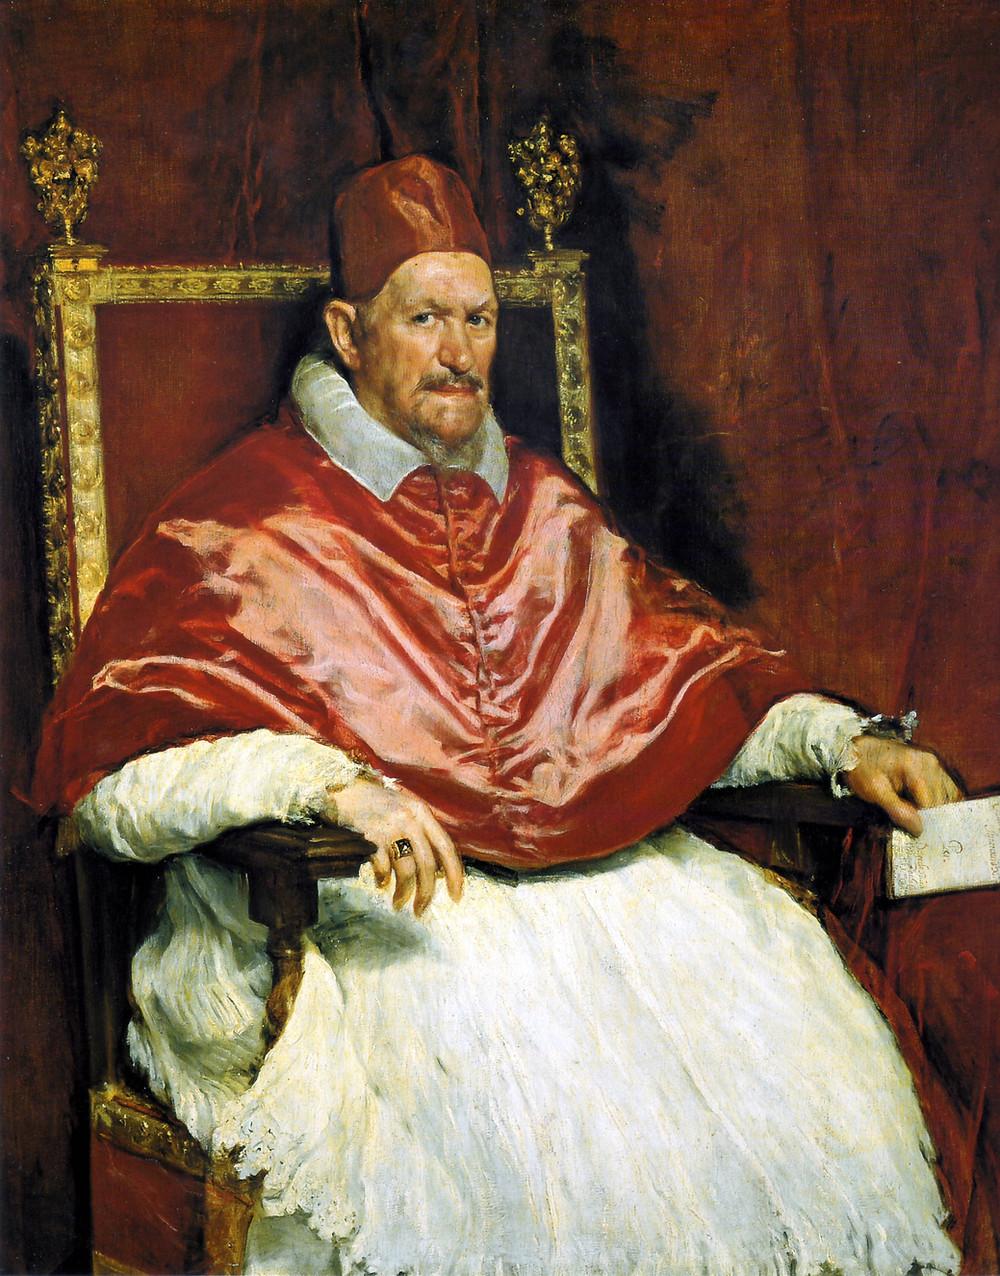 Retrato do Papa Inocencio por Diego Velazquez